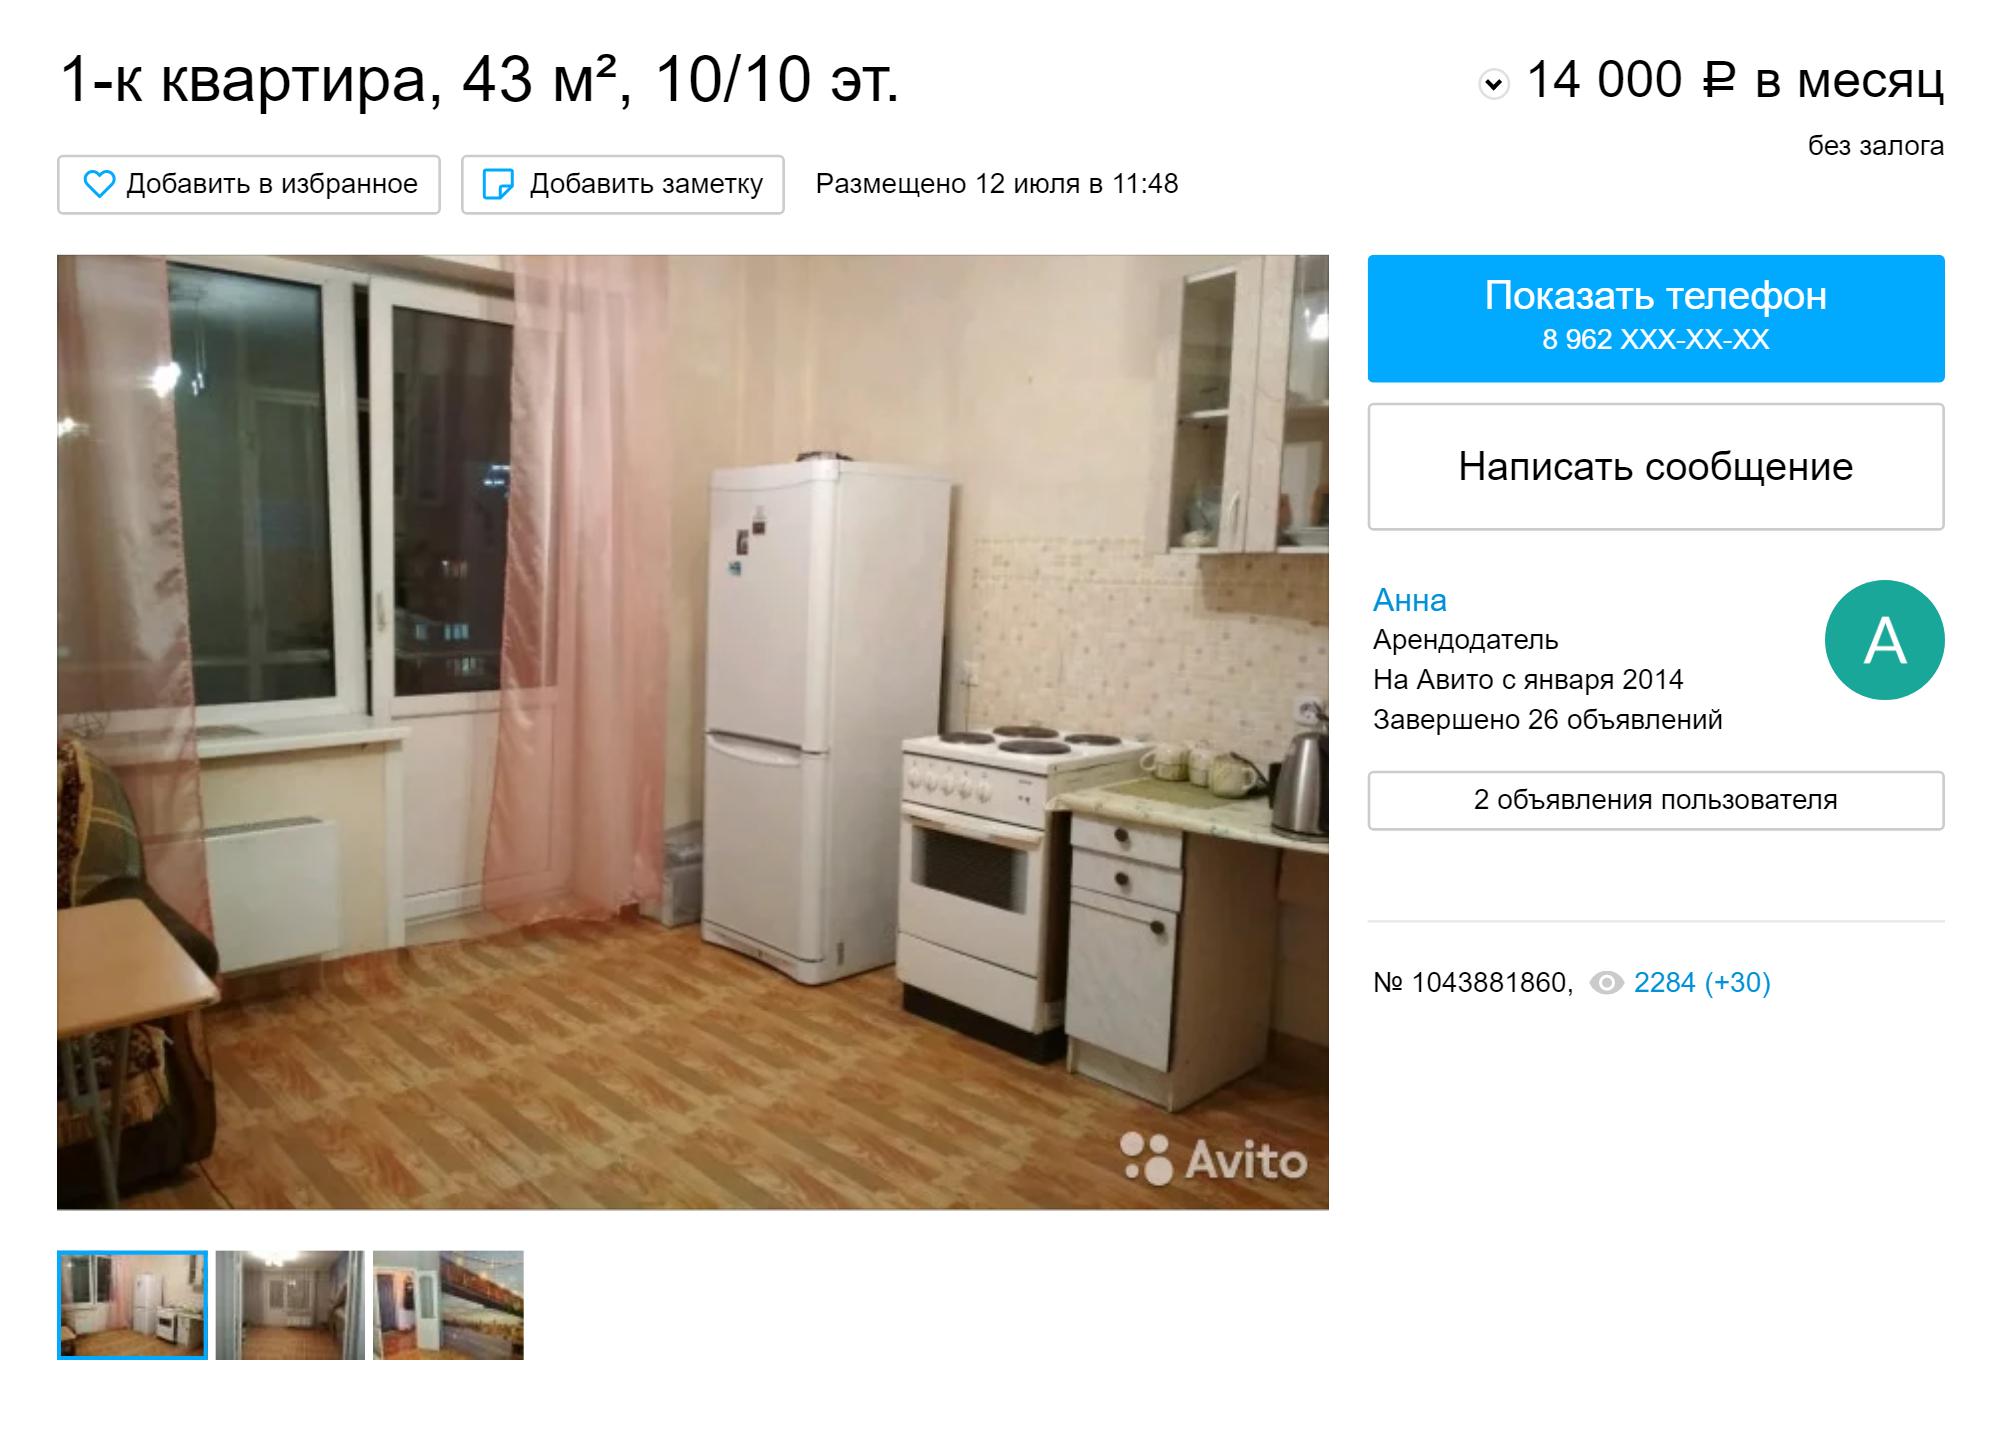 Квартира на улице Алексеева в Советском районе — там снимать дороже